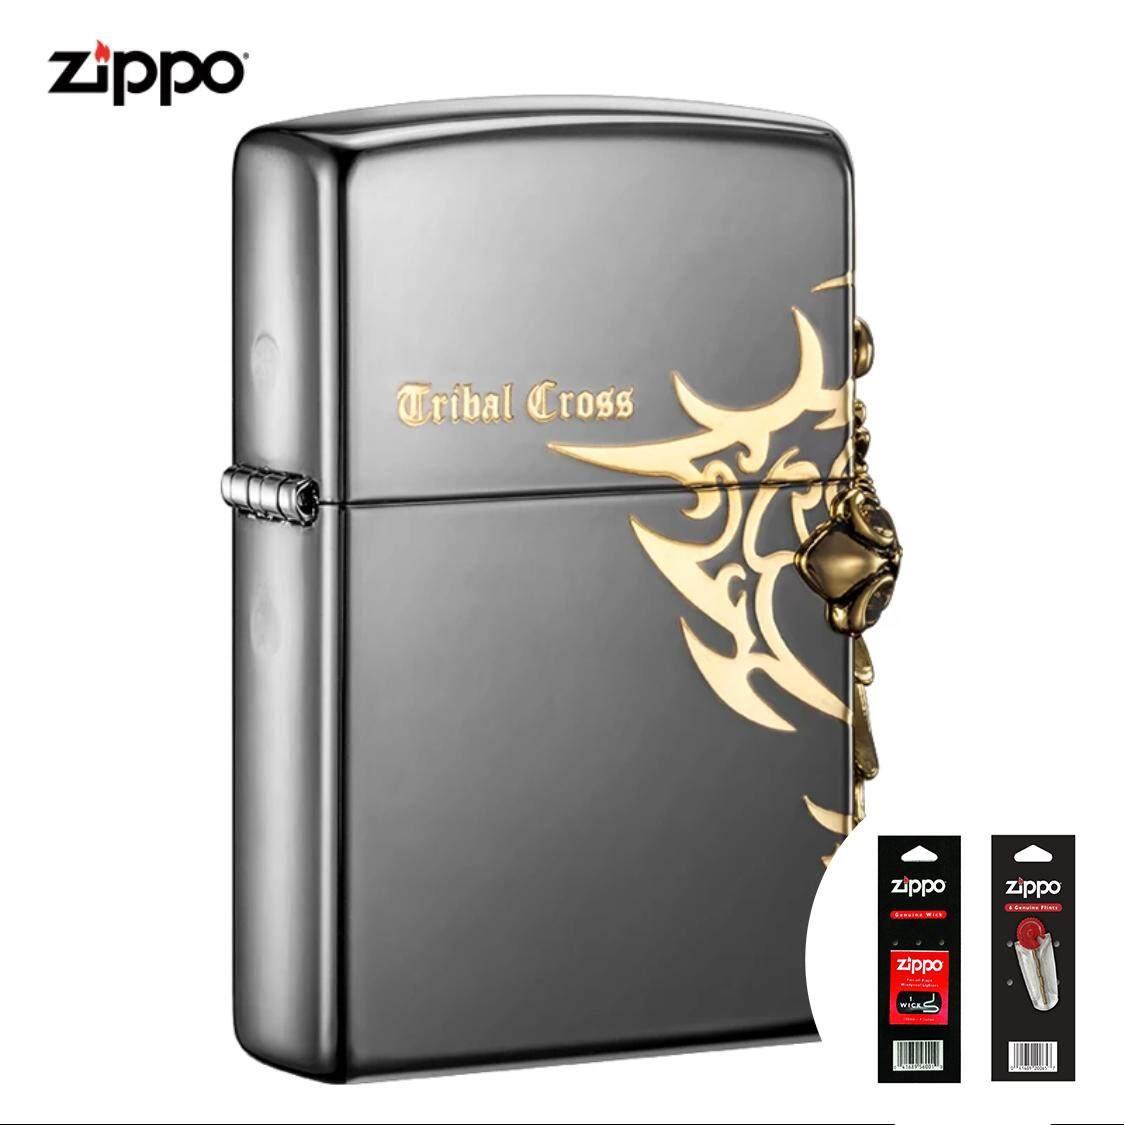 Korean Black Ice Tribal Cross Side Version Zippo Lighter - Free Zippo Flints & Wick